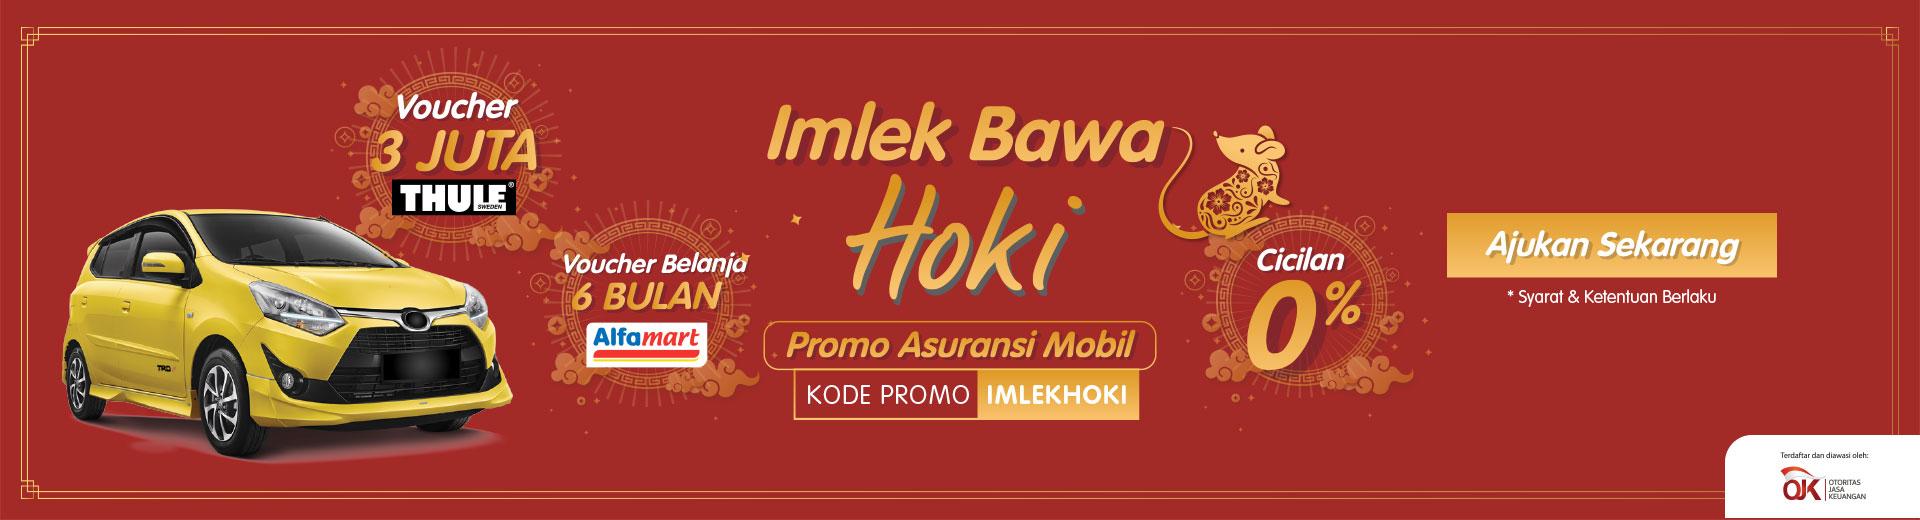 Promo gardaoto.com #IMLEKHOKI